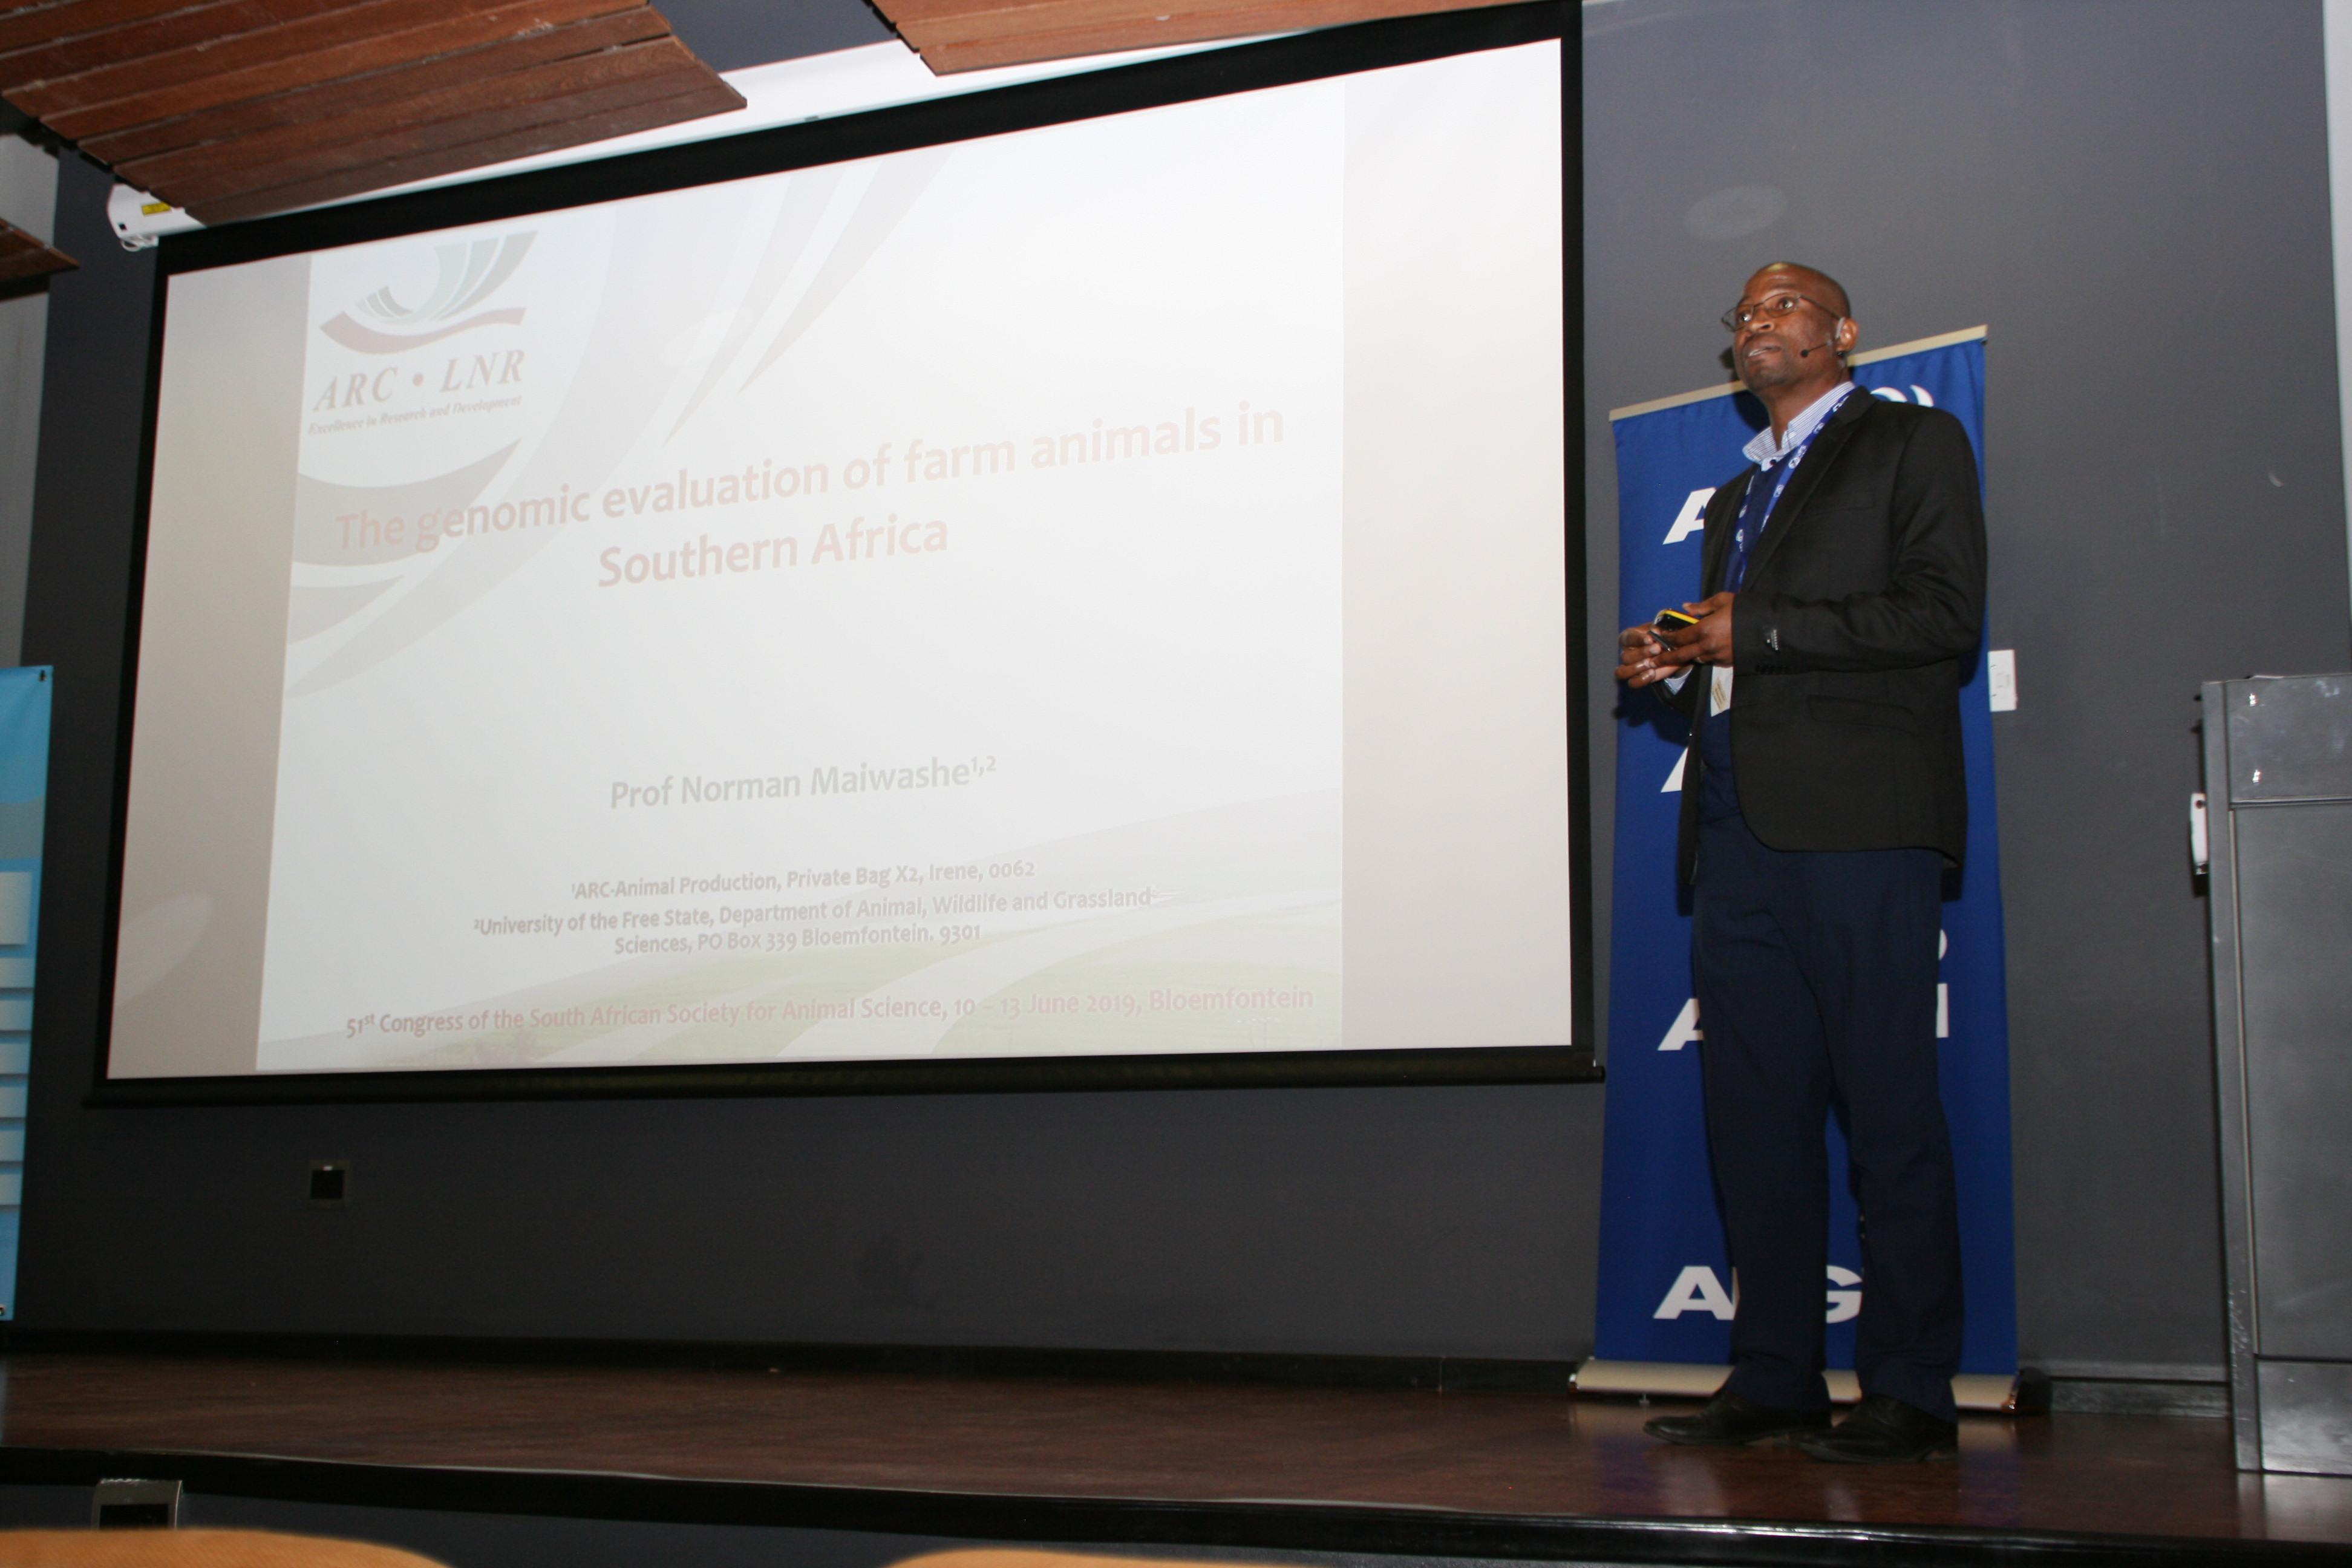 Prof Norman Malwashe